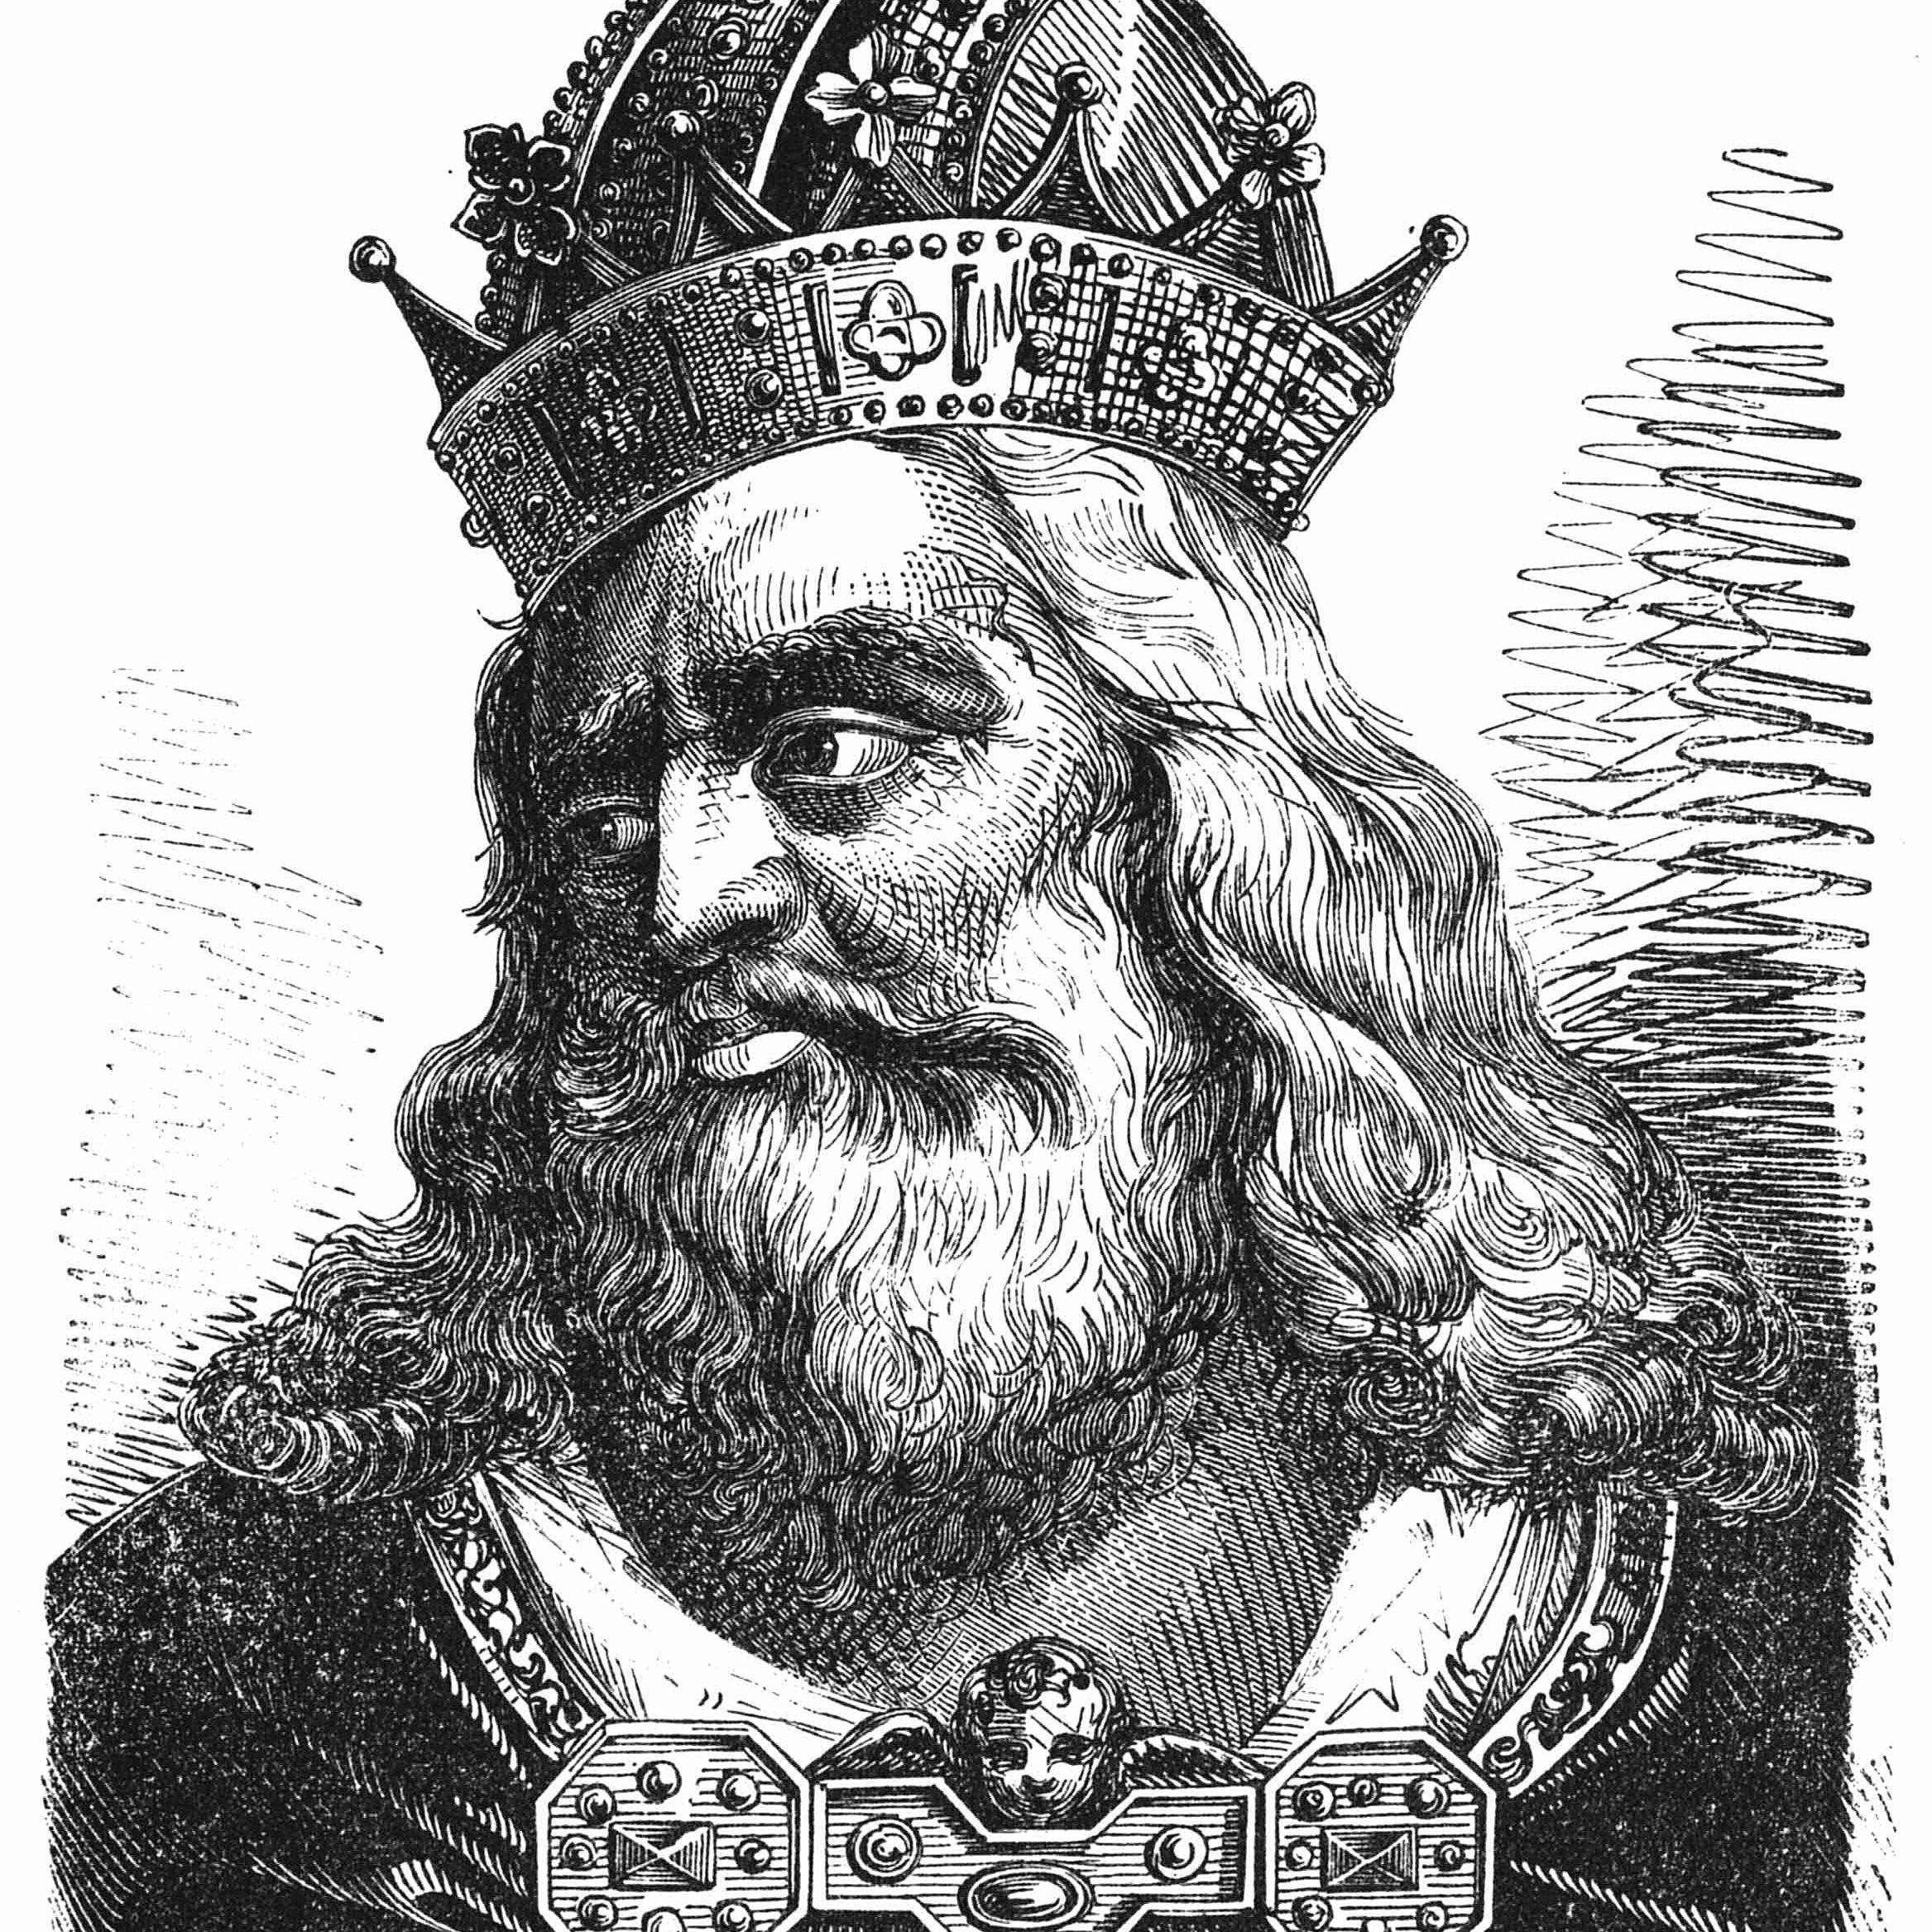 Nineteenth-century illustration